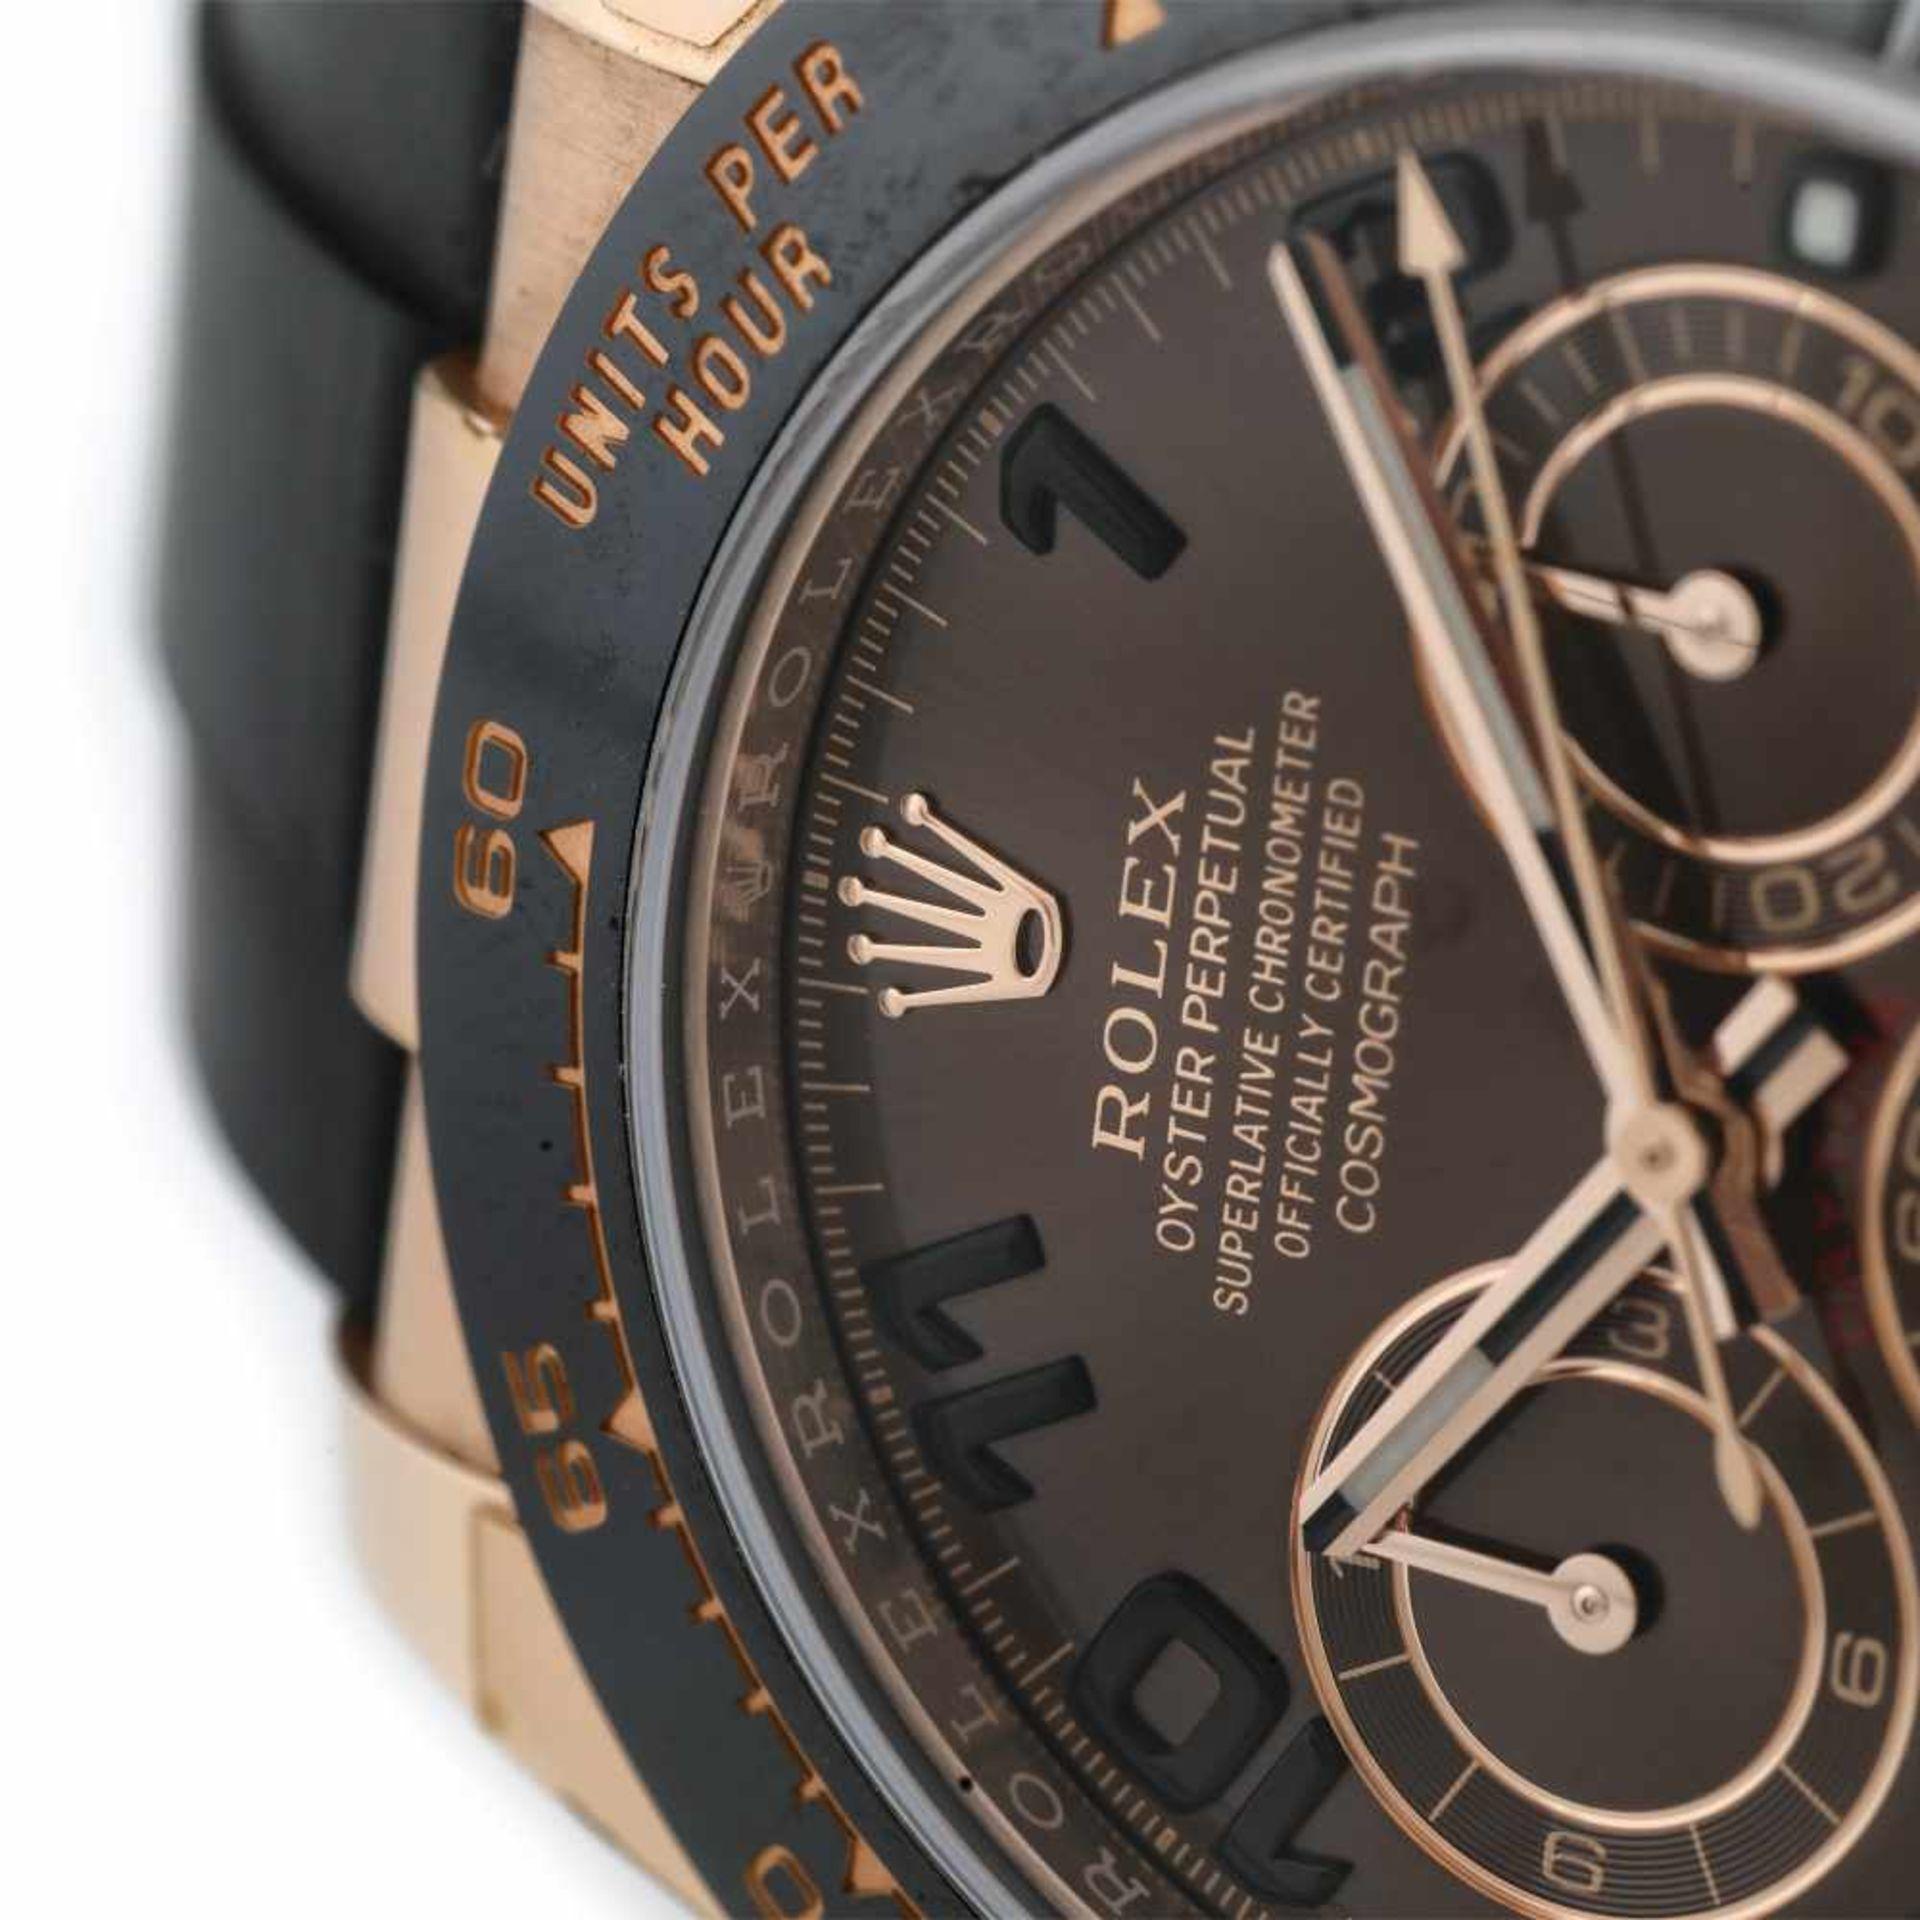 Rolex Daytona wristwatch, rose gold, unisex, original box - Bild 3 aus 3